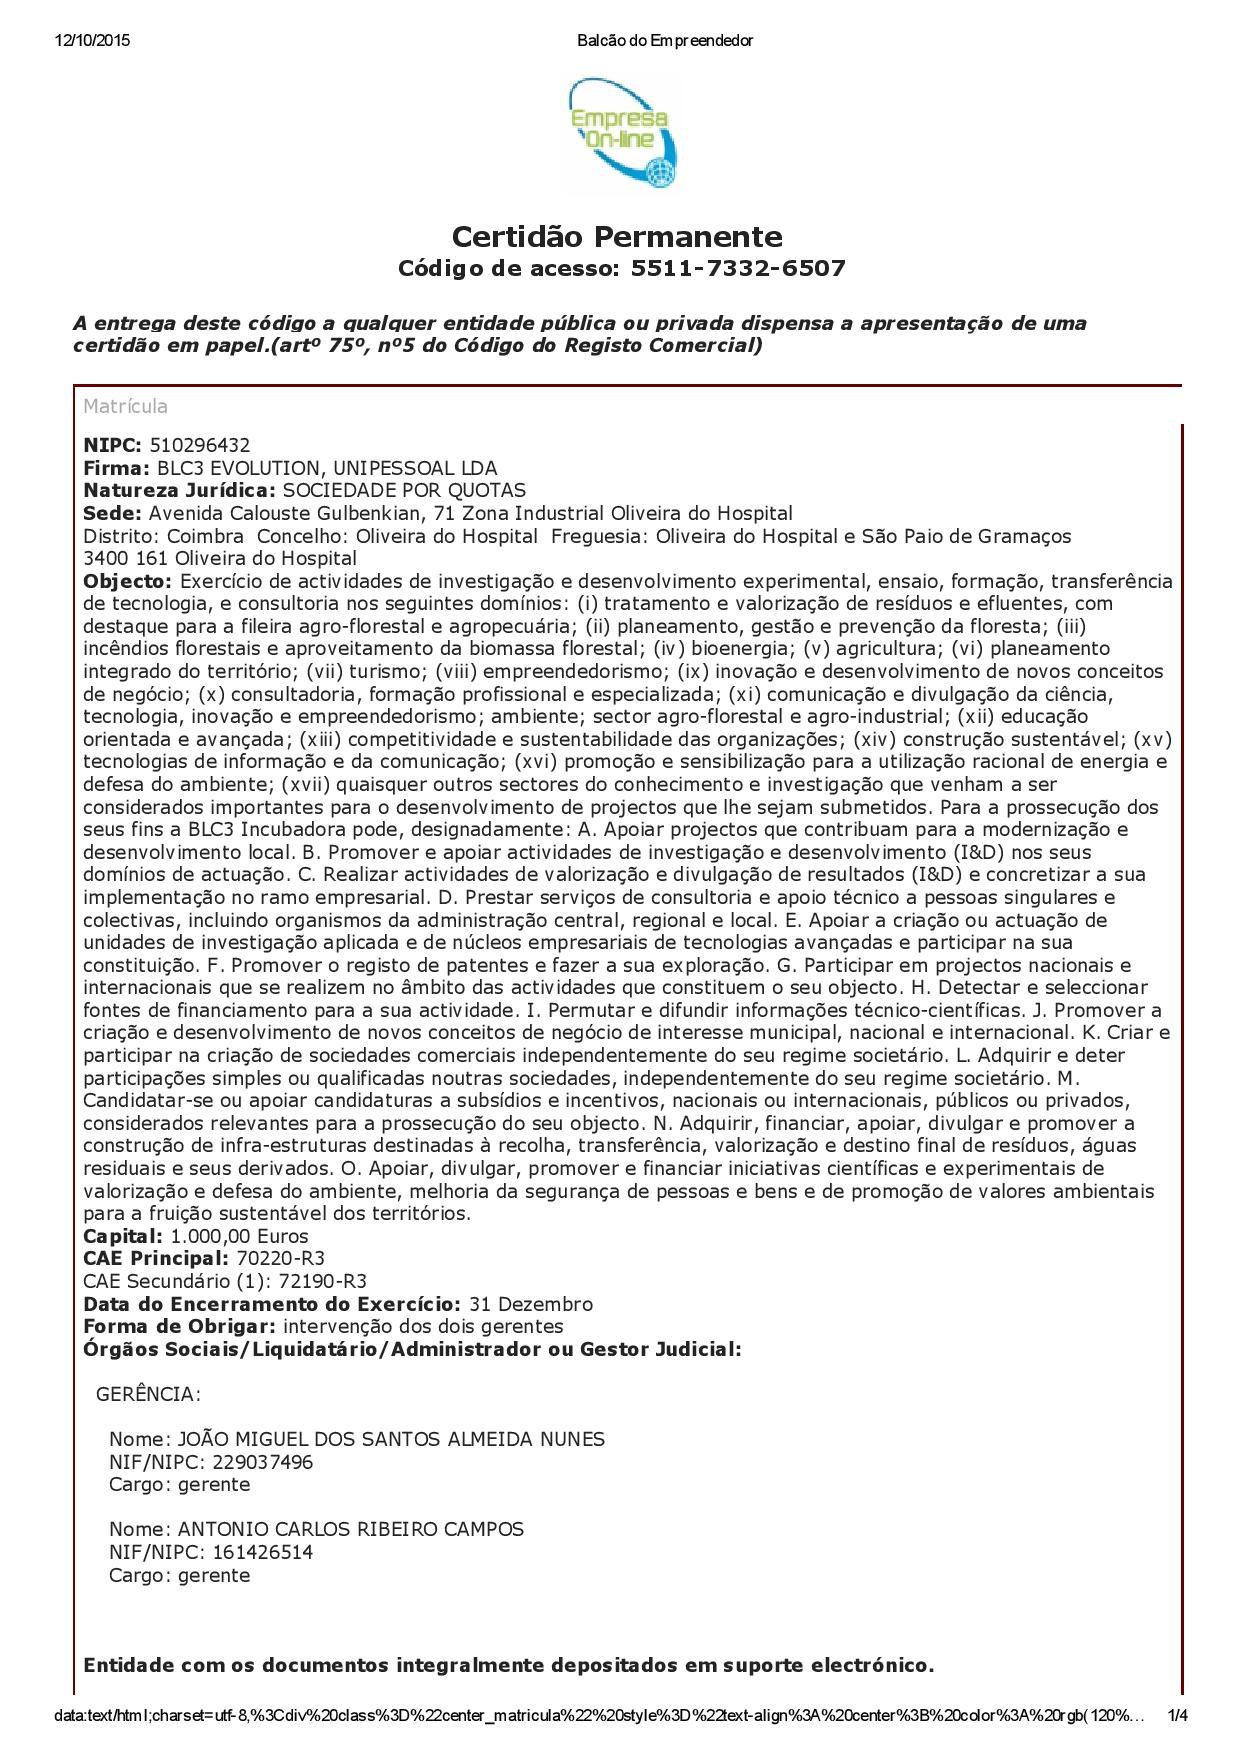 CP_BLC3 evolucion-page-001